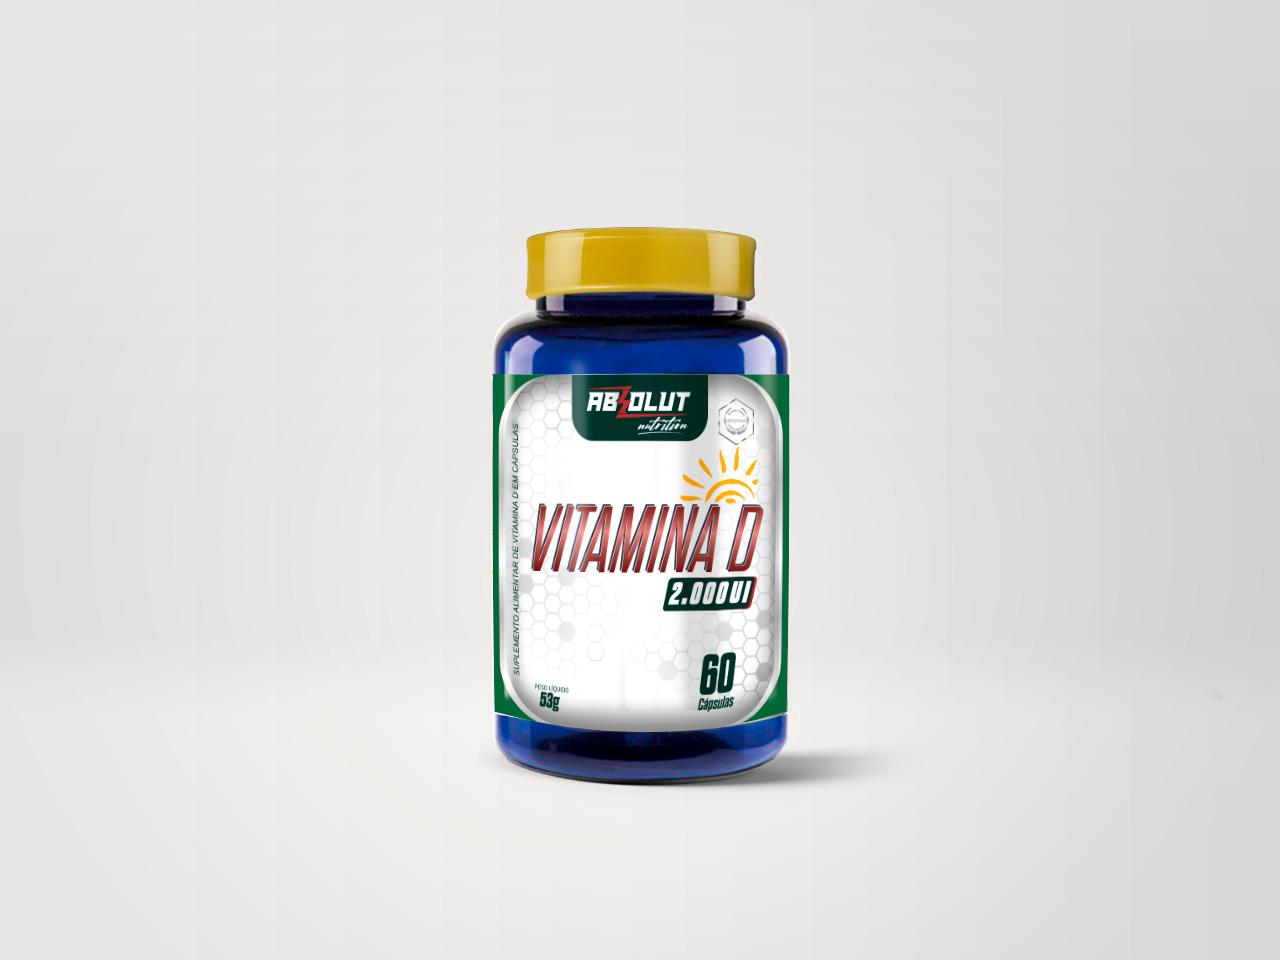 Vitamina D - 60 caps - Absolut Nutrition